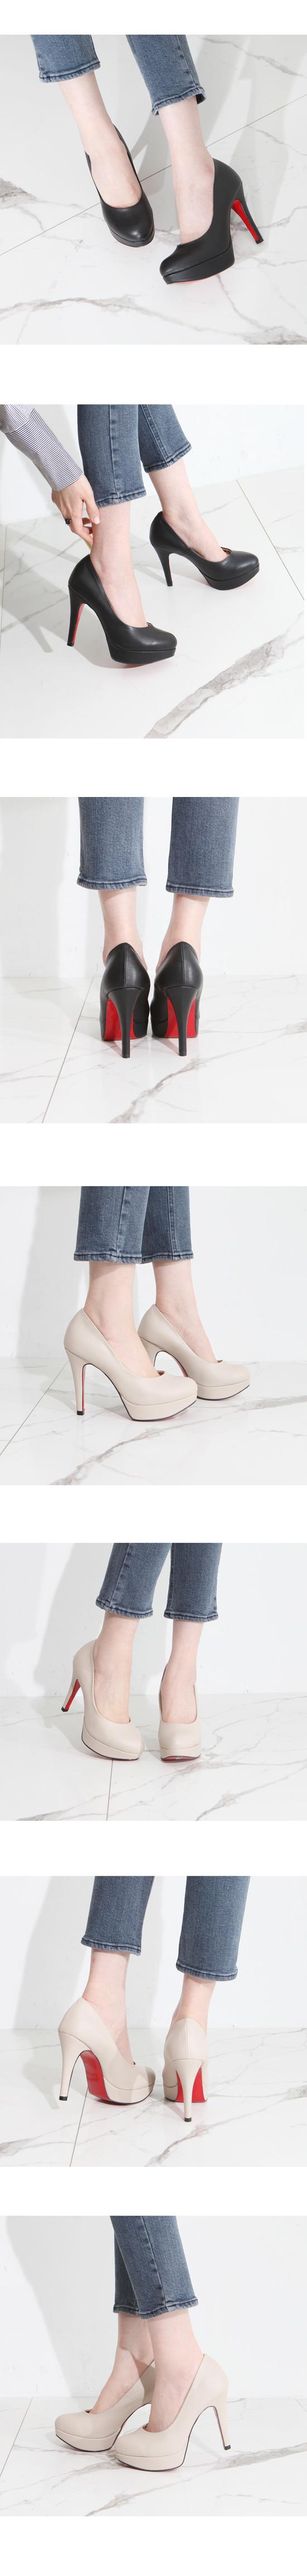 Round nose heels high heels 11cm beige